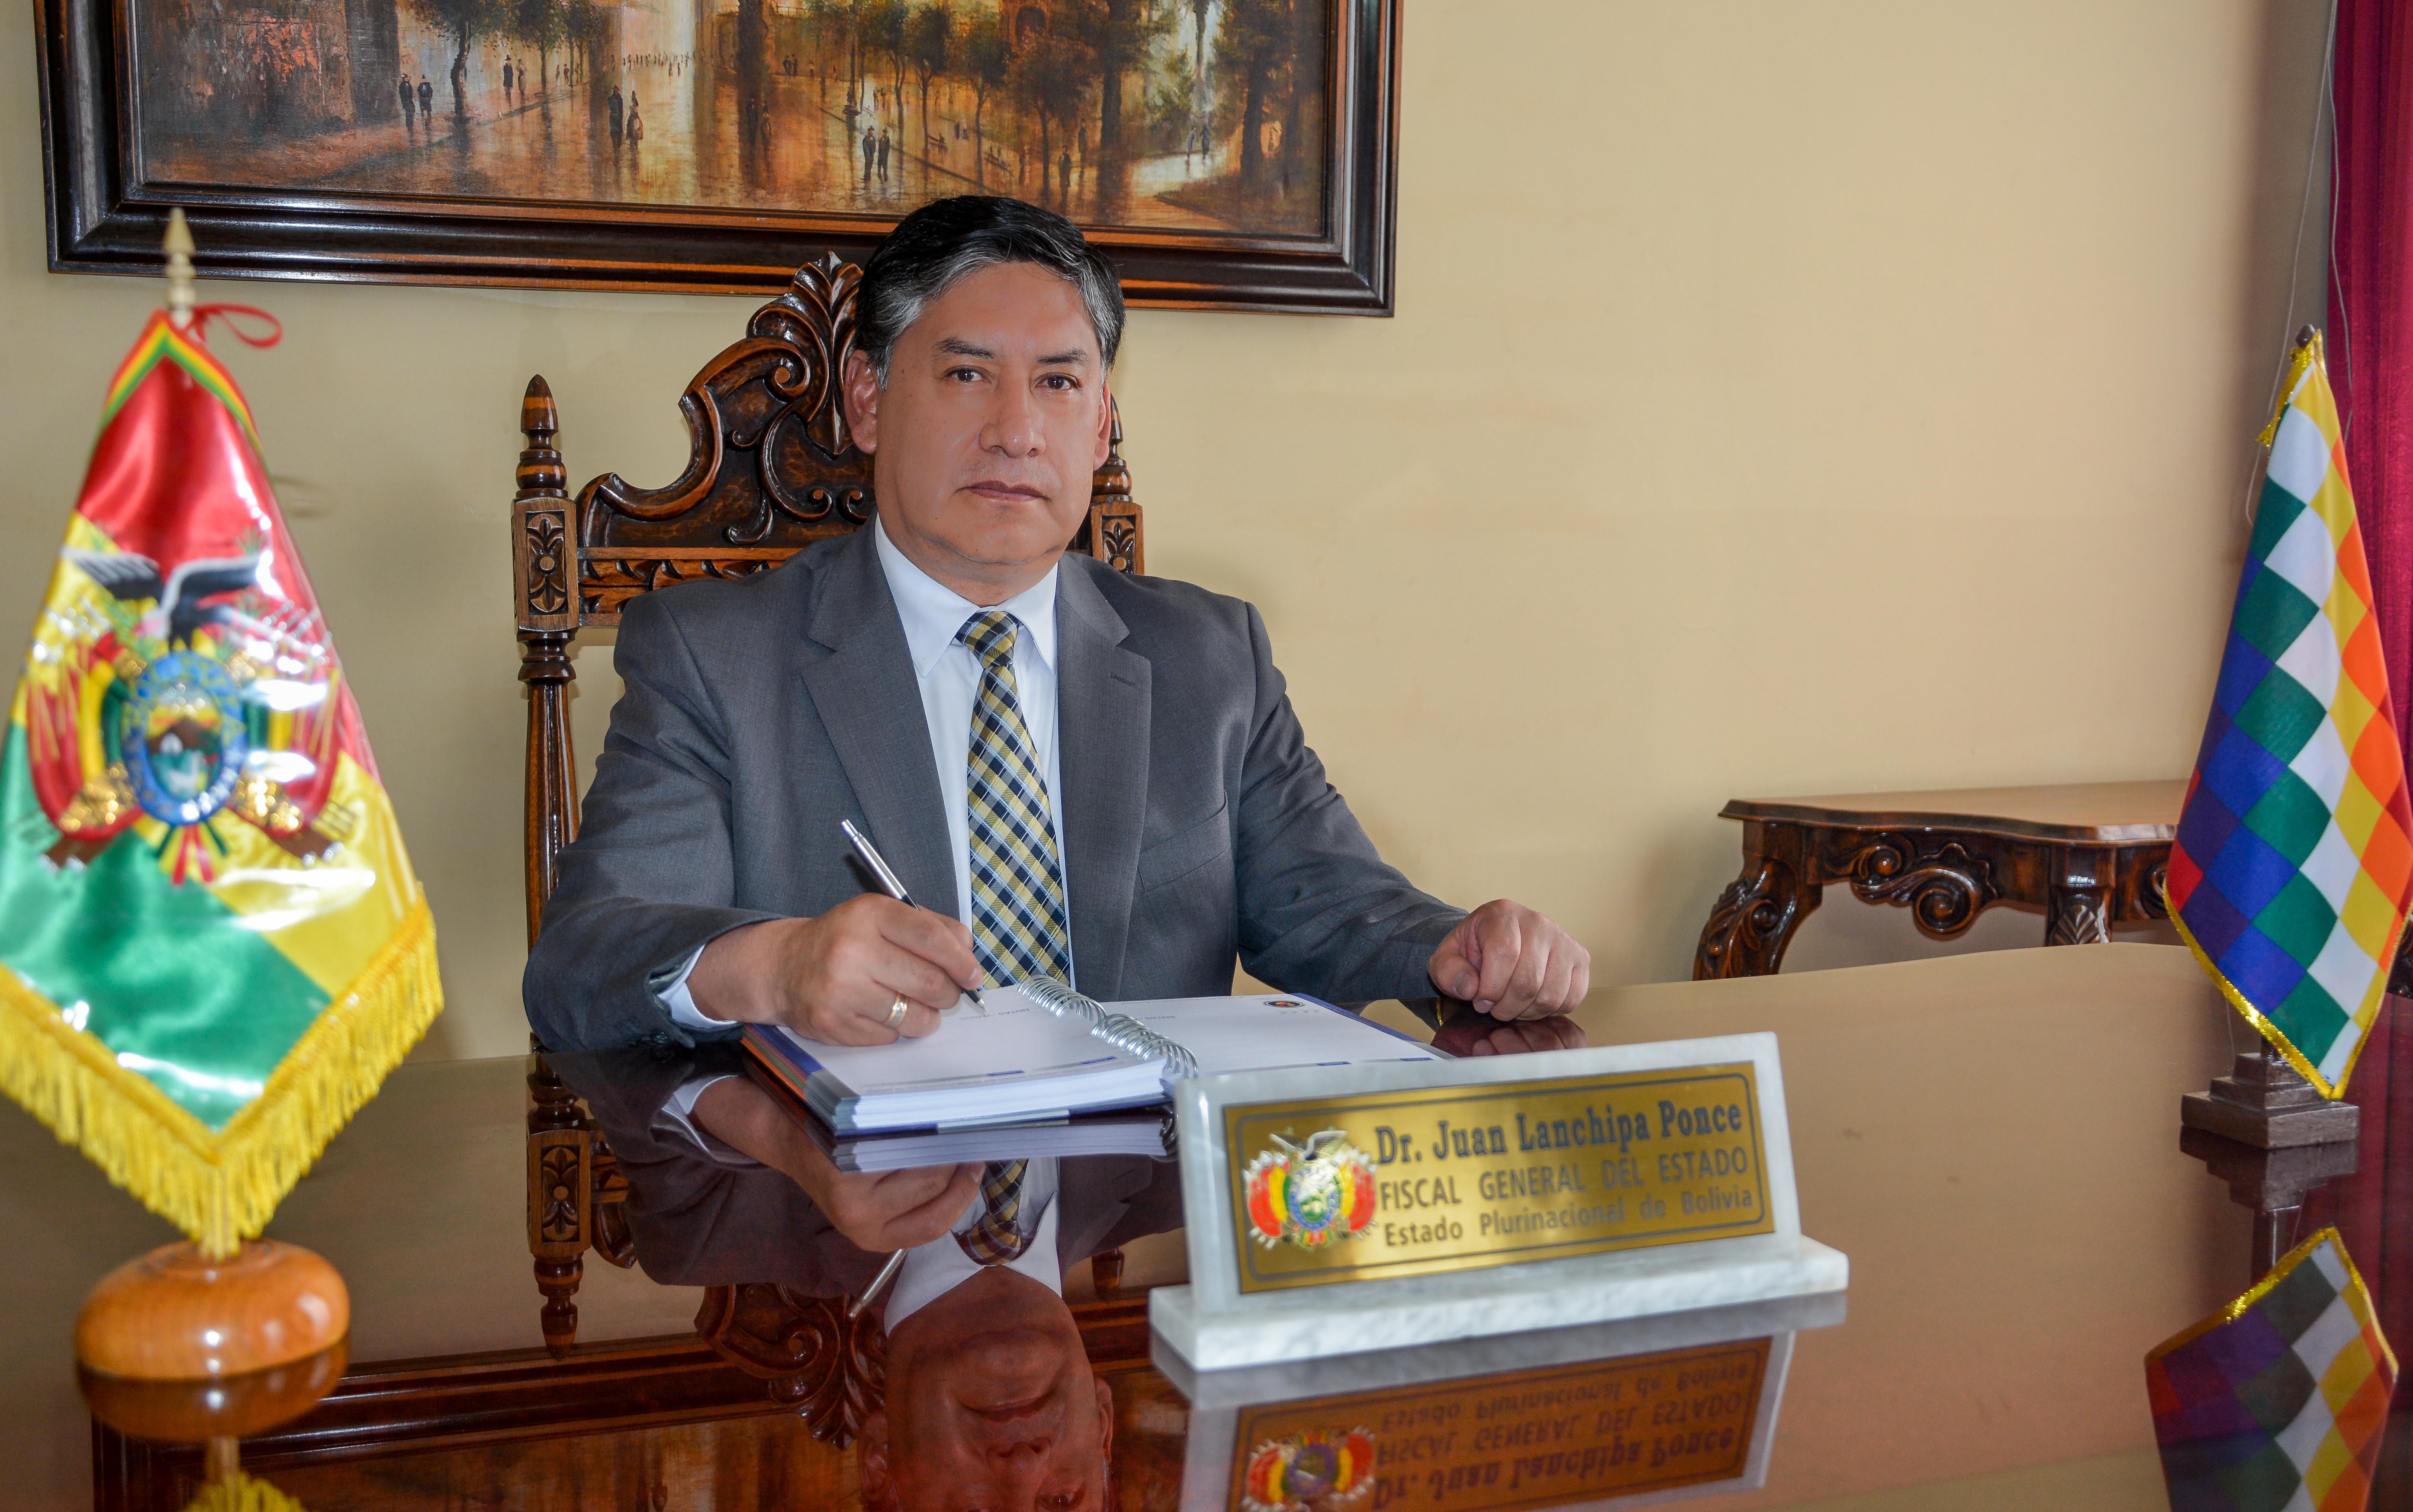 Fausto Juan Lanchipa Ponce - Fiscal General del Estado Plurinacional de Bolivia